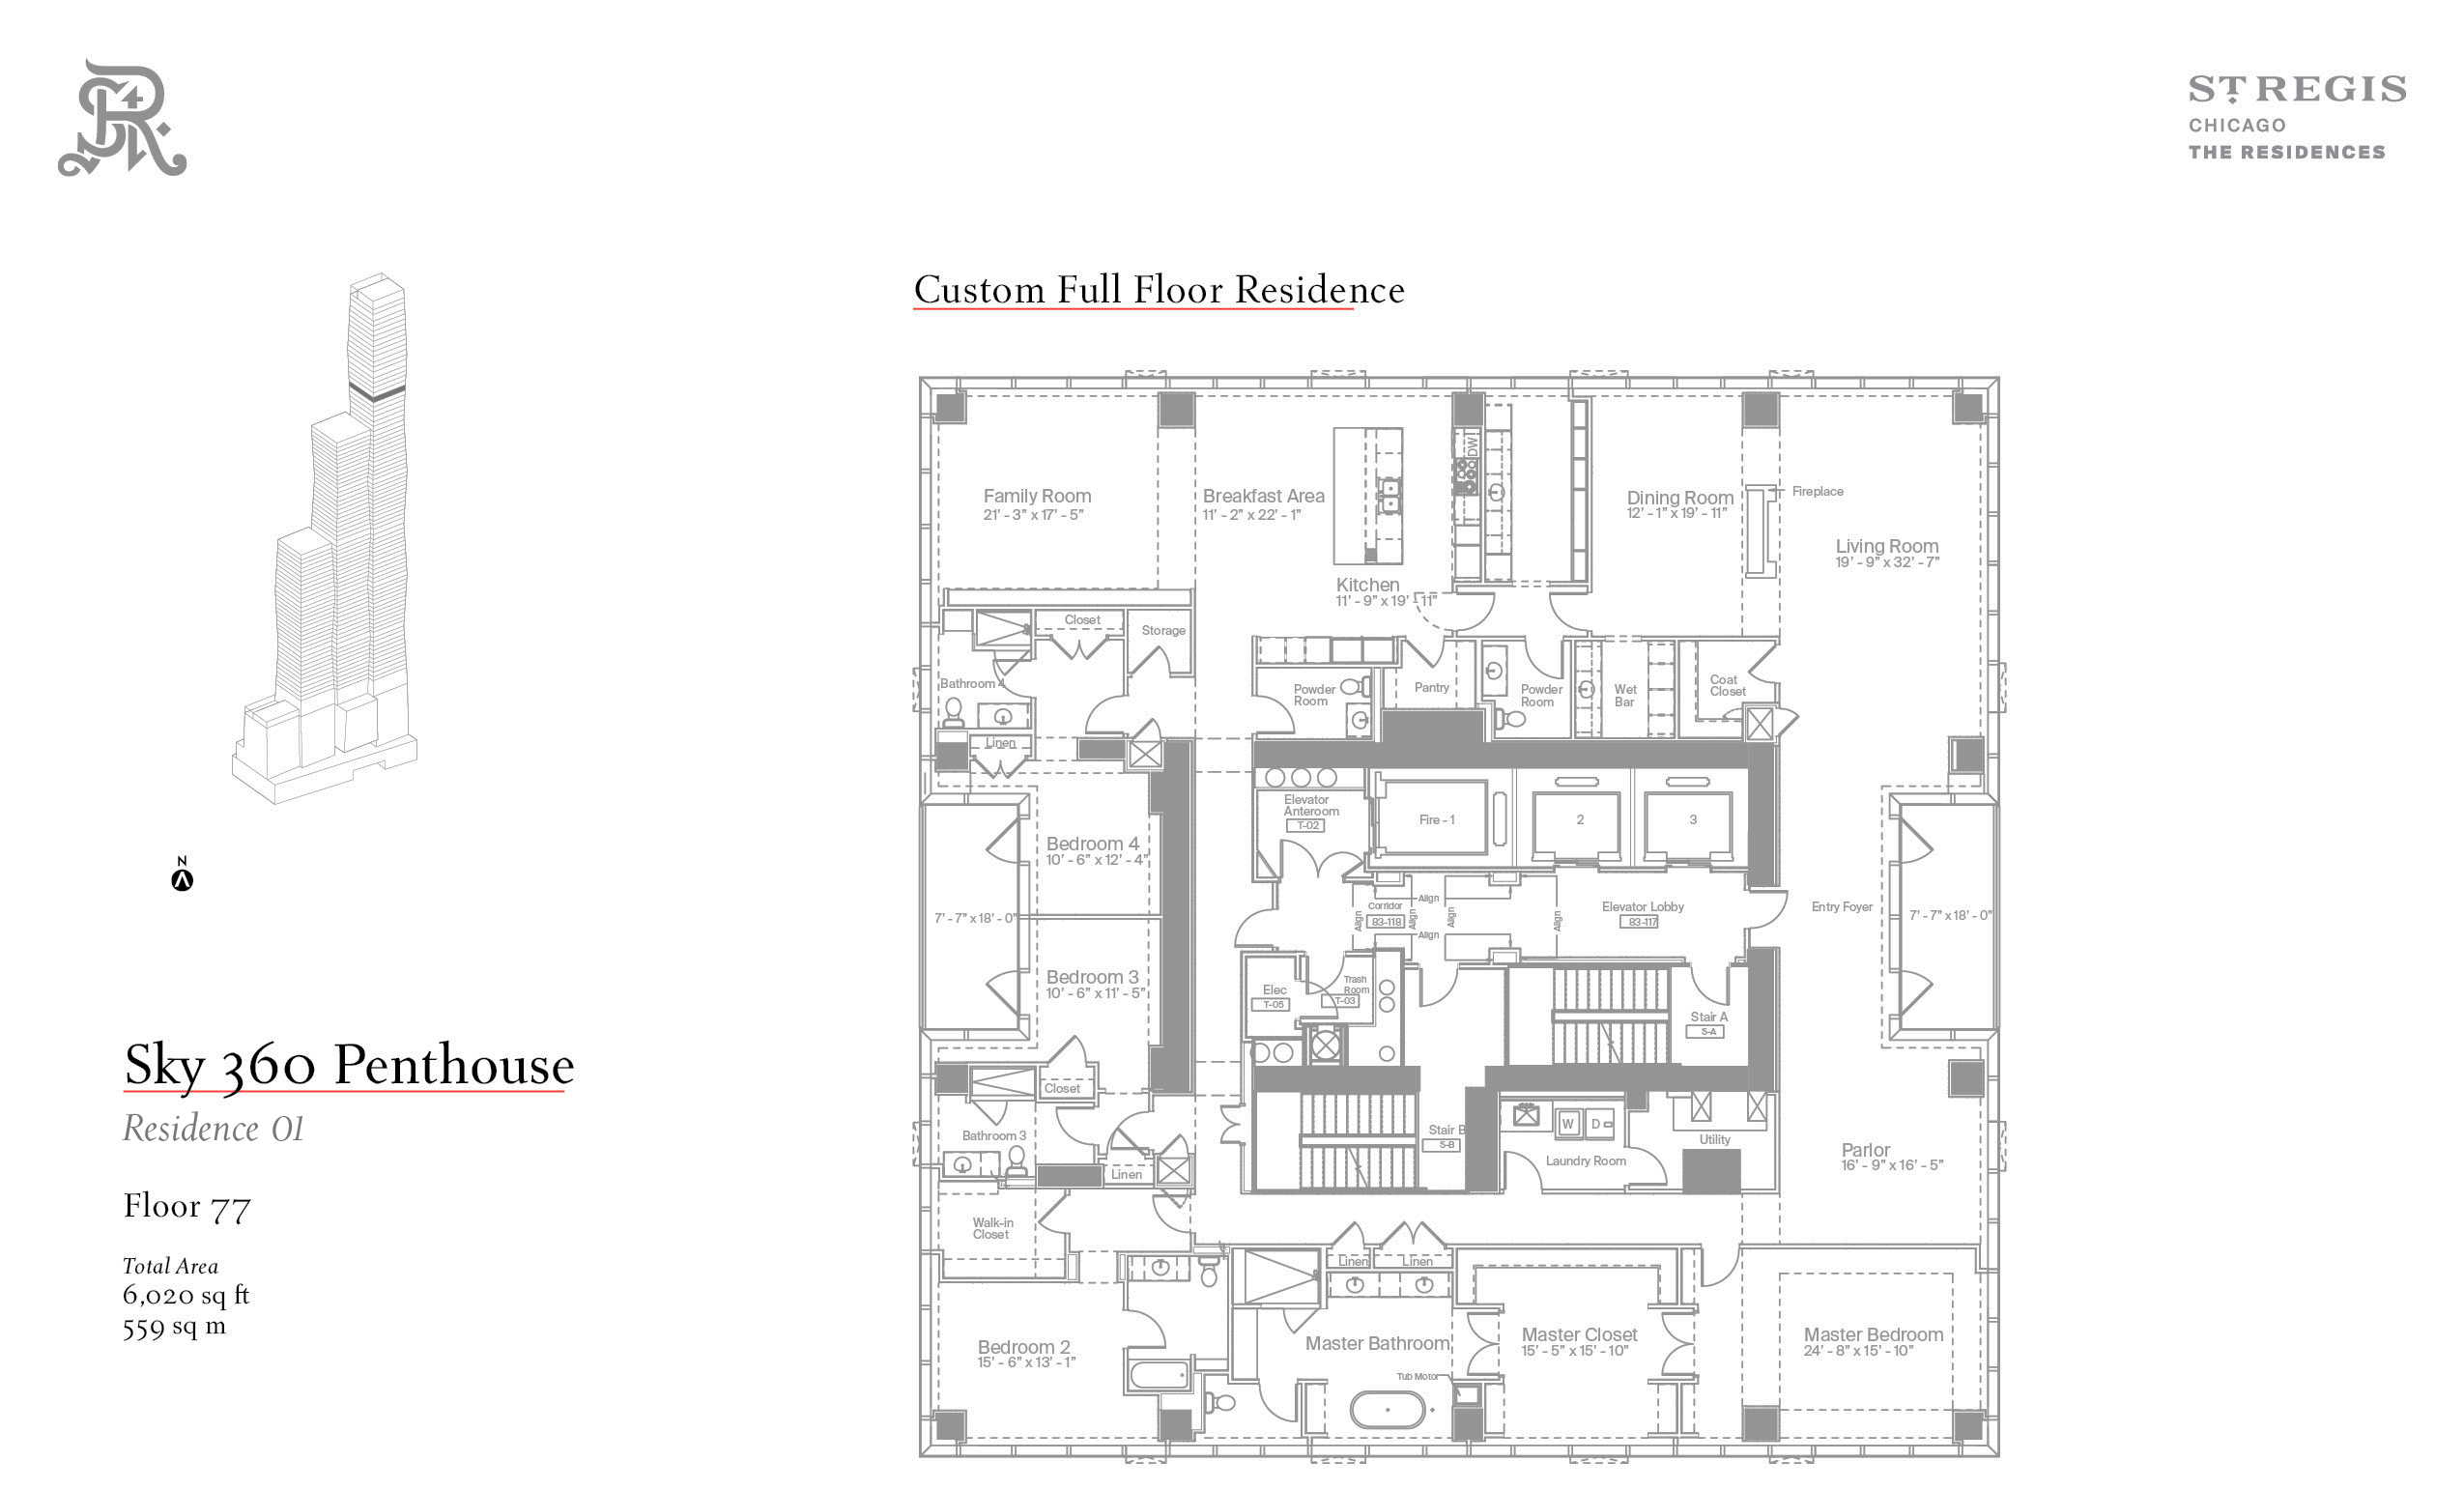 Sample penthouse floor plan